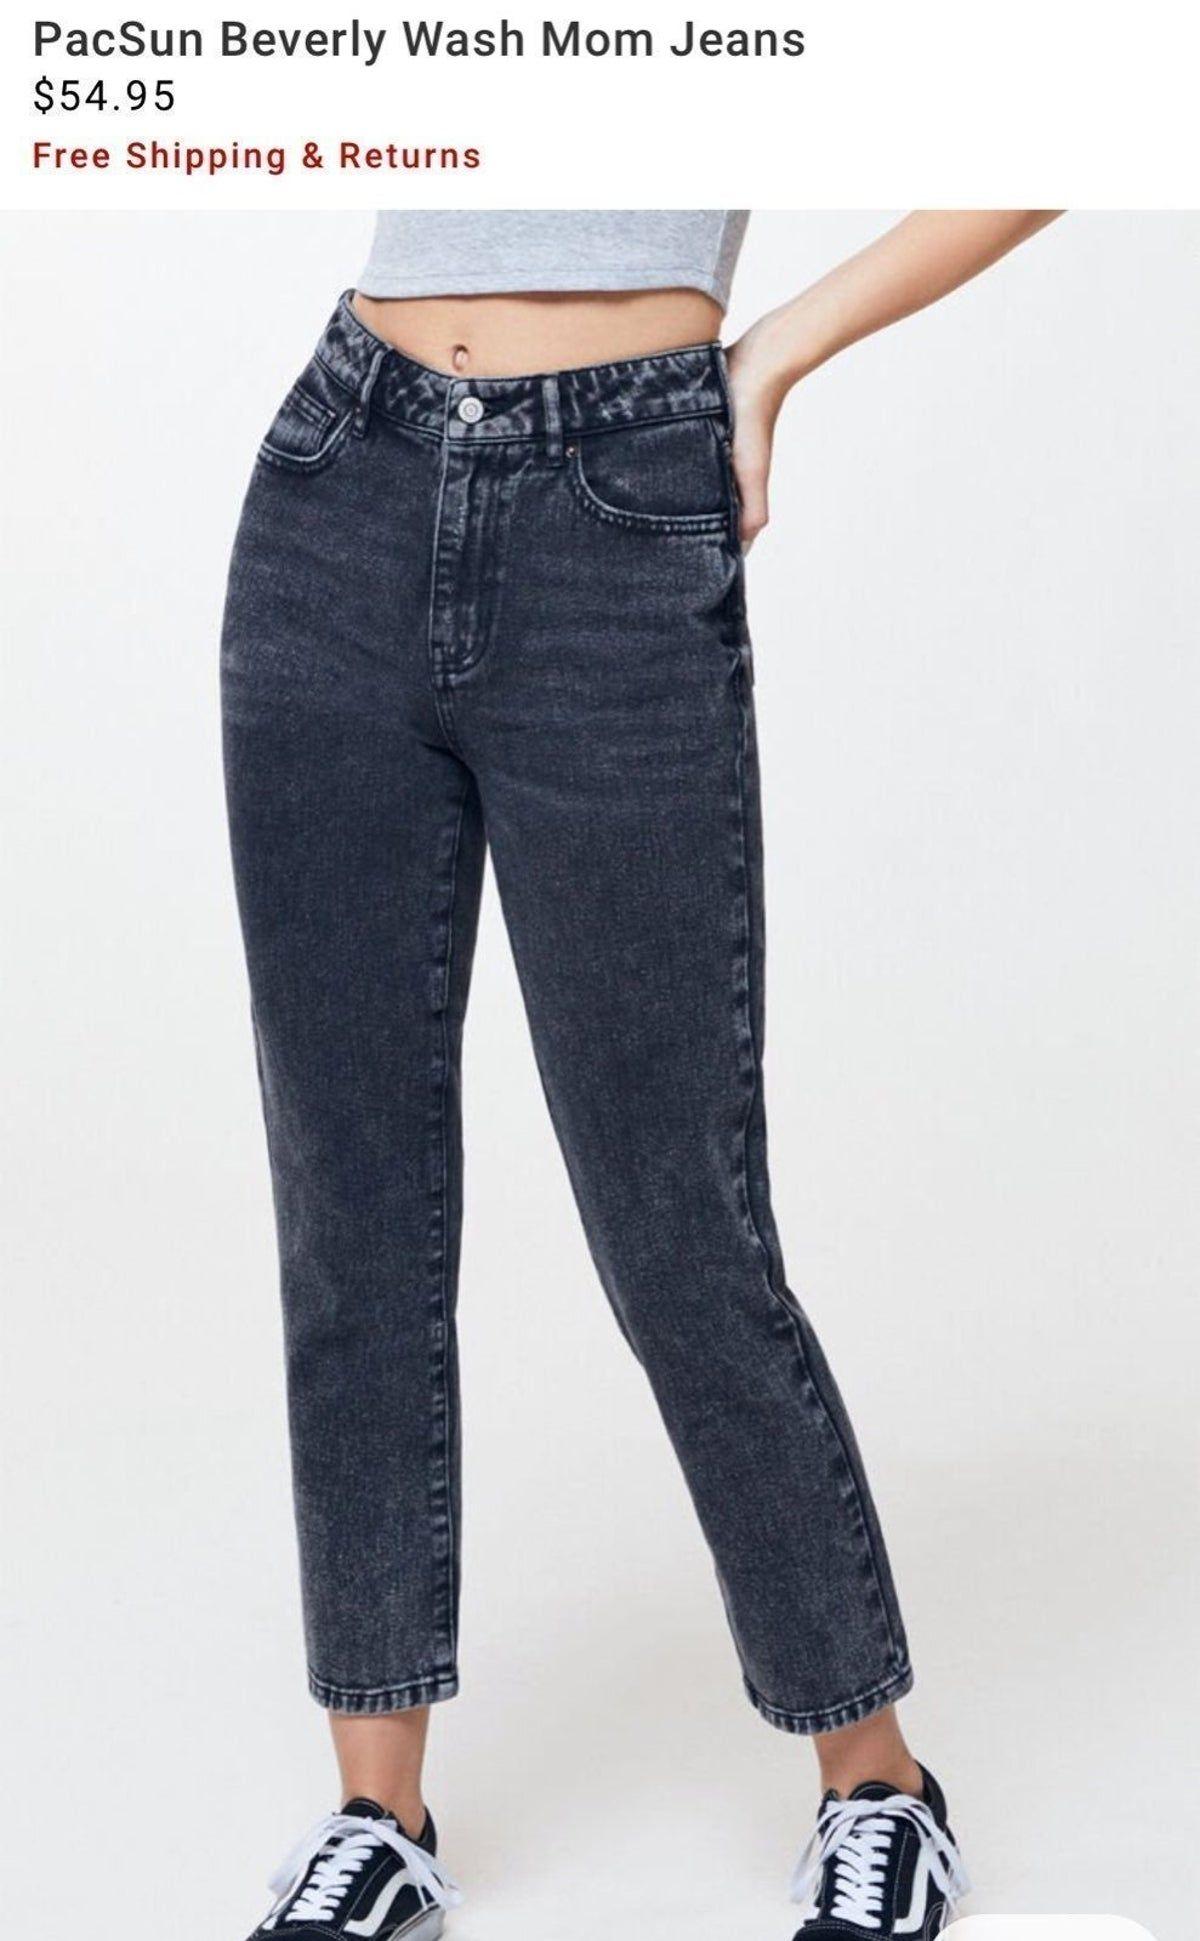 Pacsun Black Mom Jeans, size 26 on Mercari